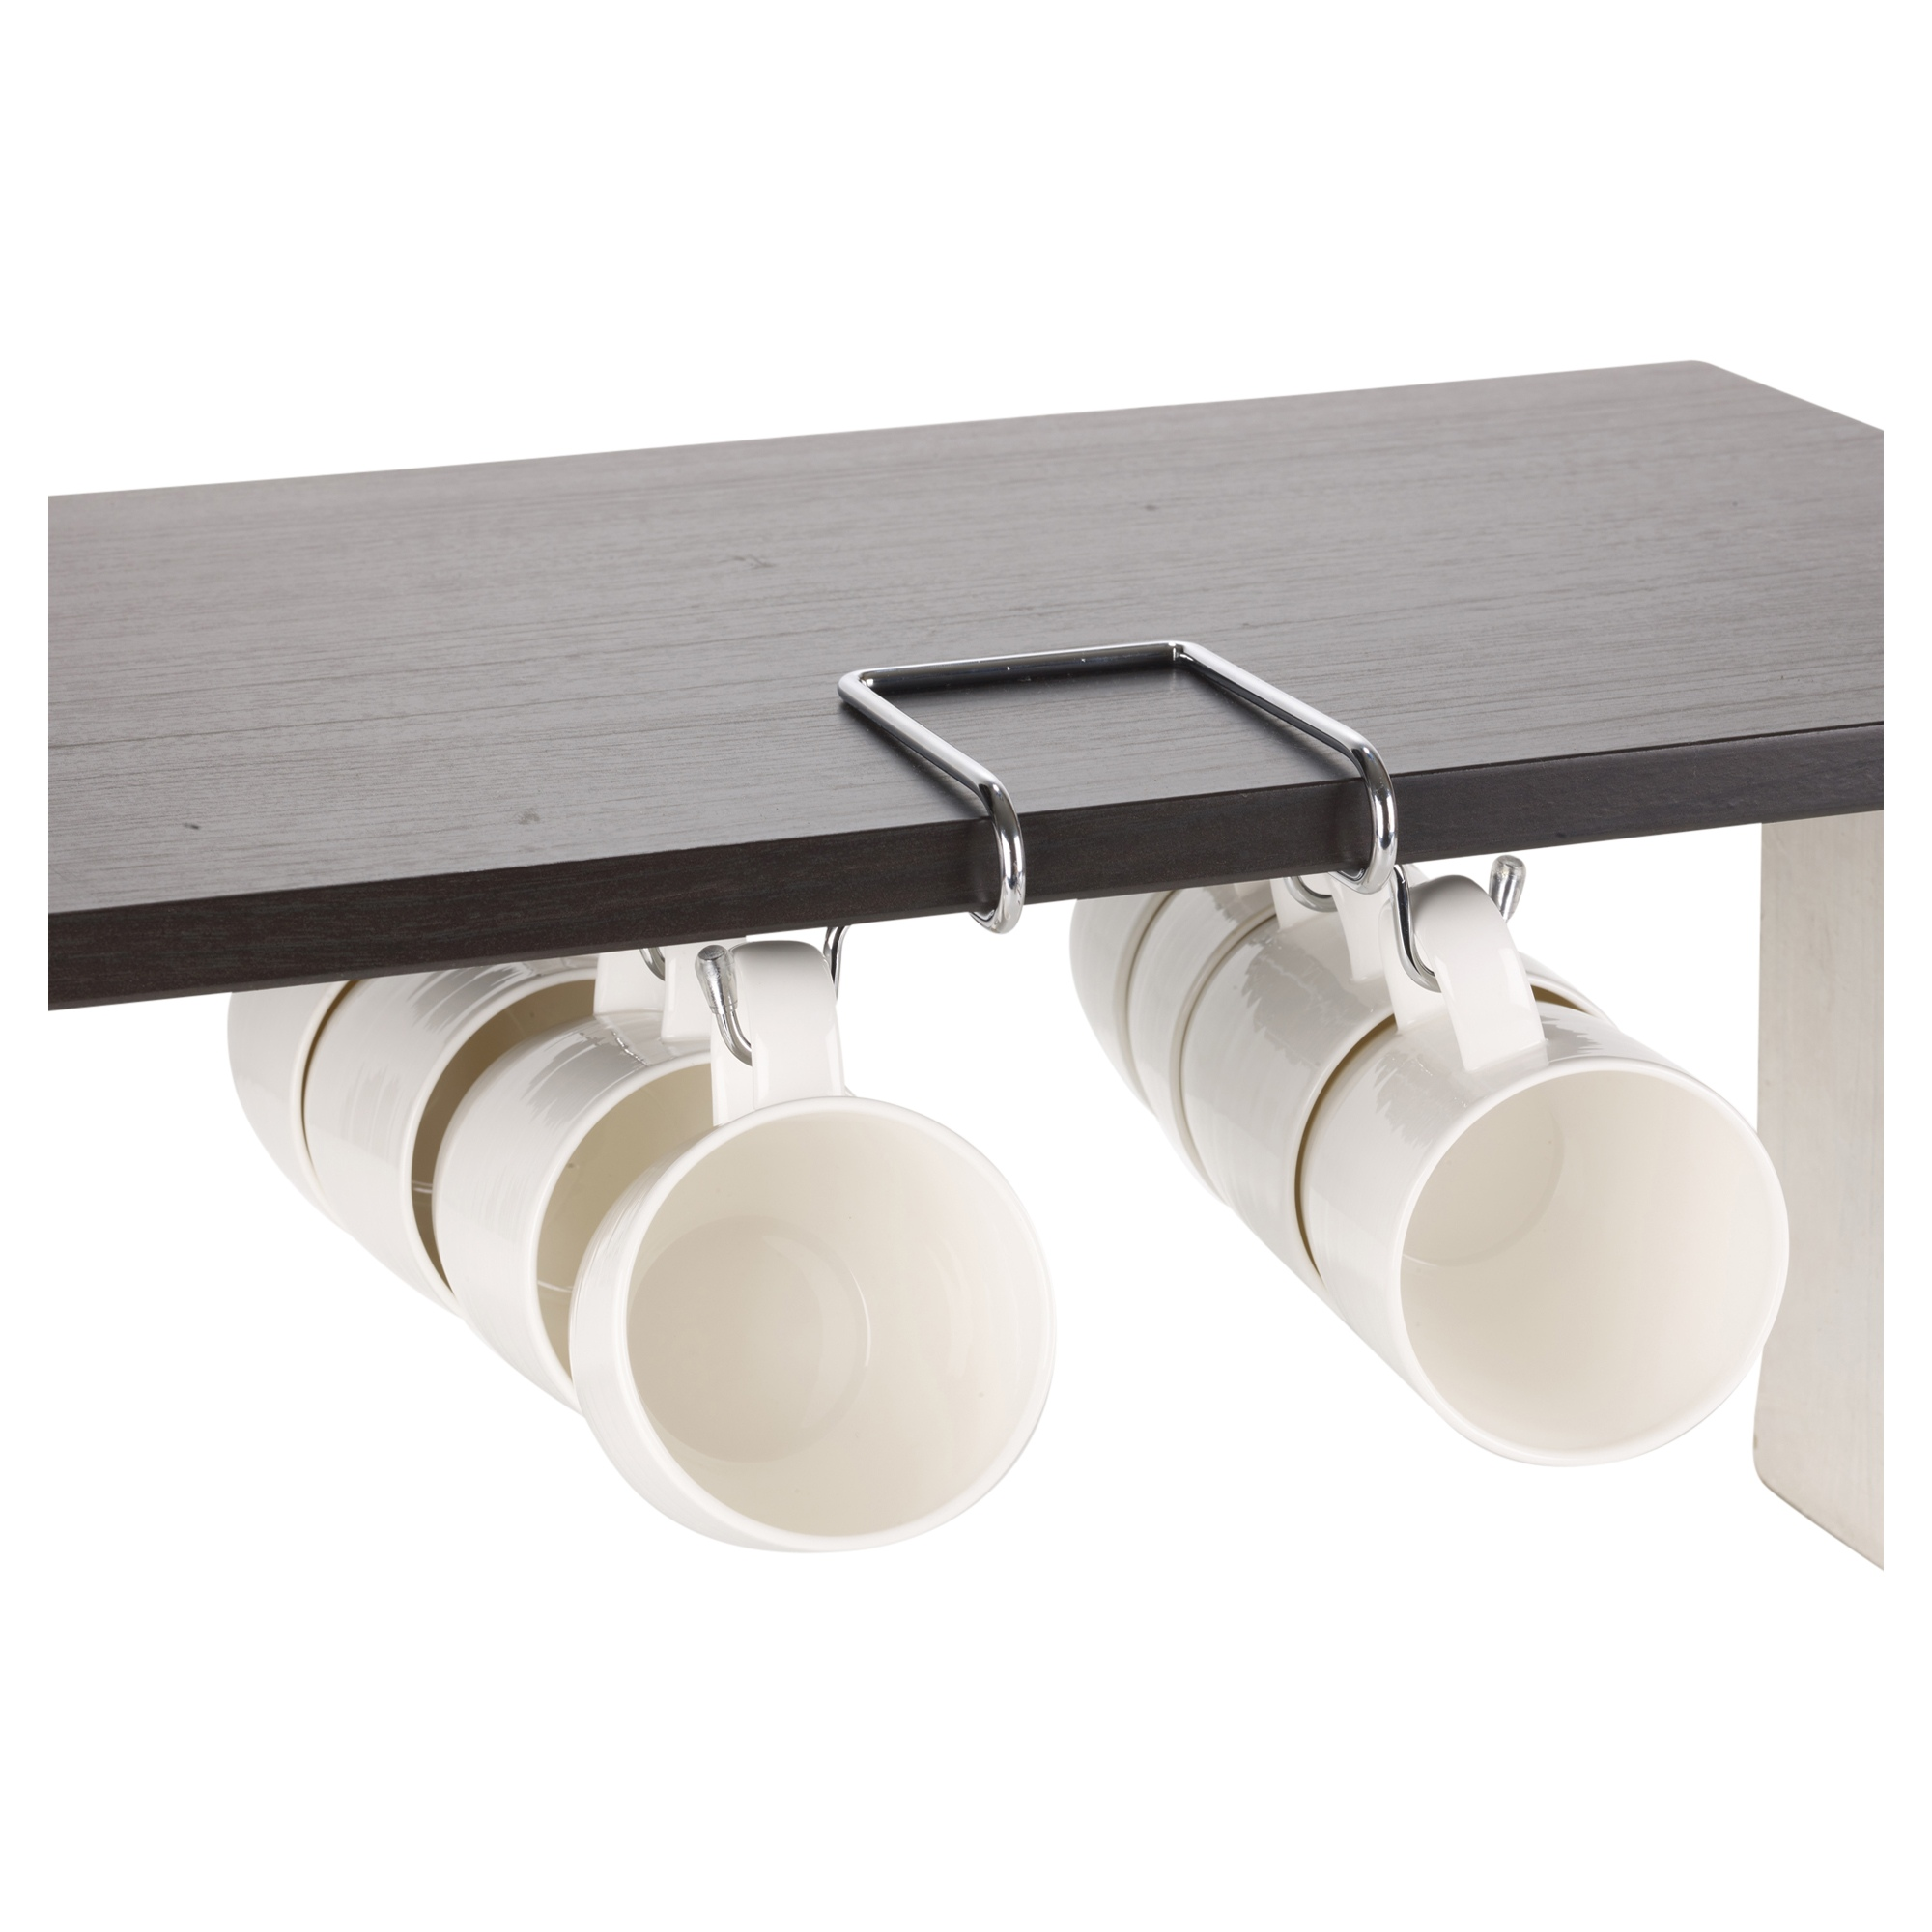 8 hook silver chrome mug rack cup holder under shelf shelf & cabinet sliding drawer organizer shelf & cabinet sliding drawer organizer